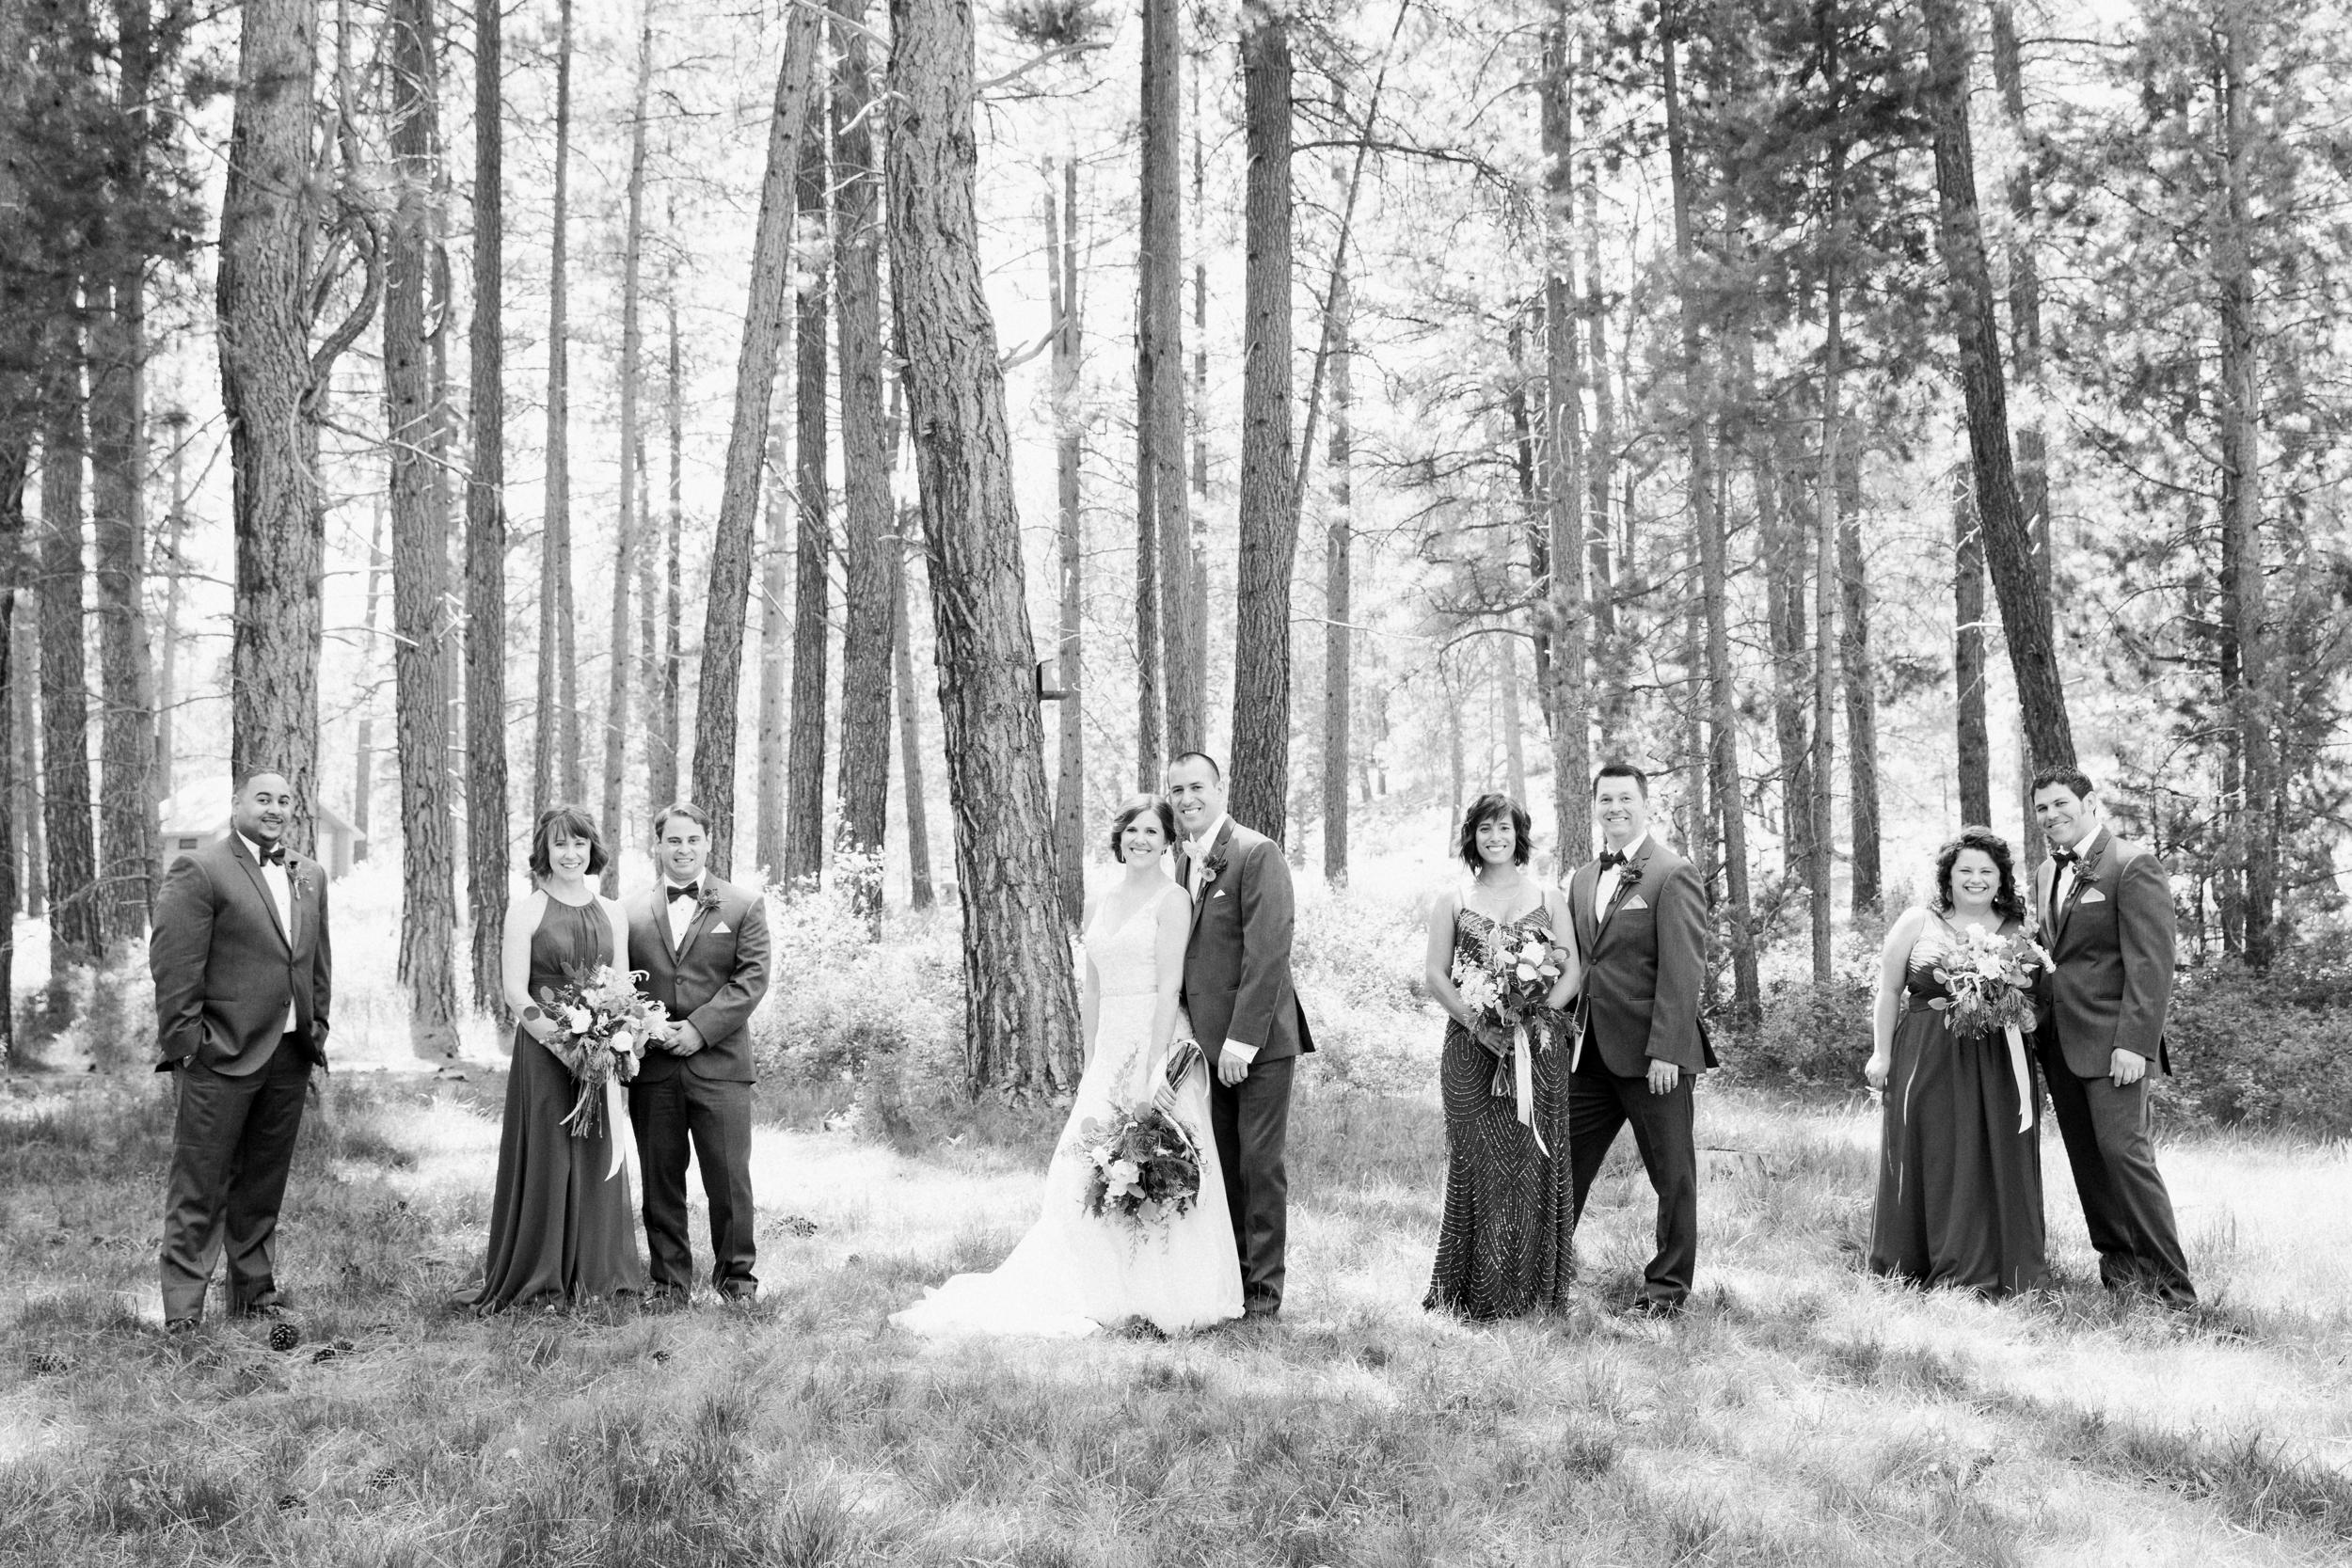 bend_wedding_photographer_76.jpg